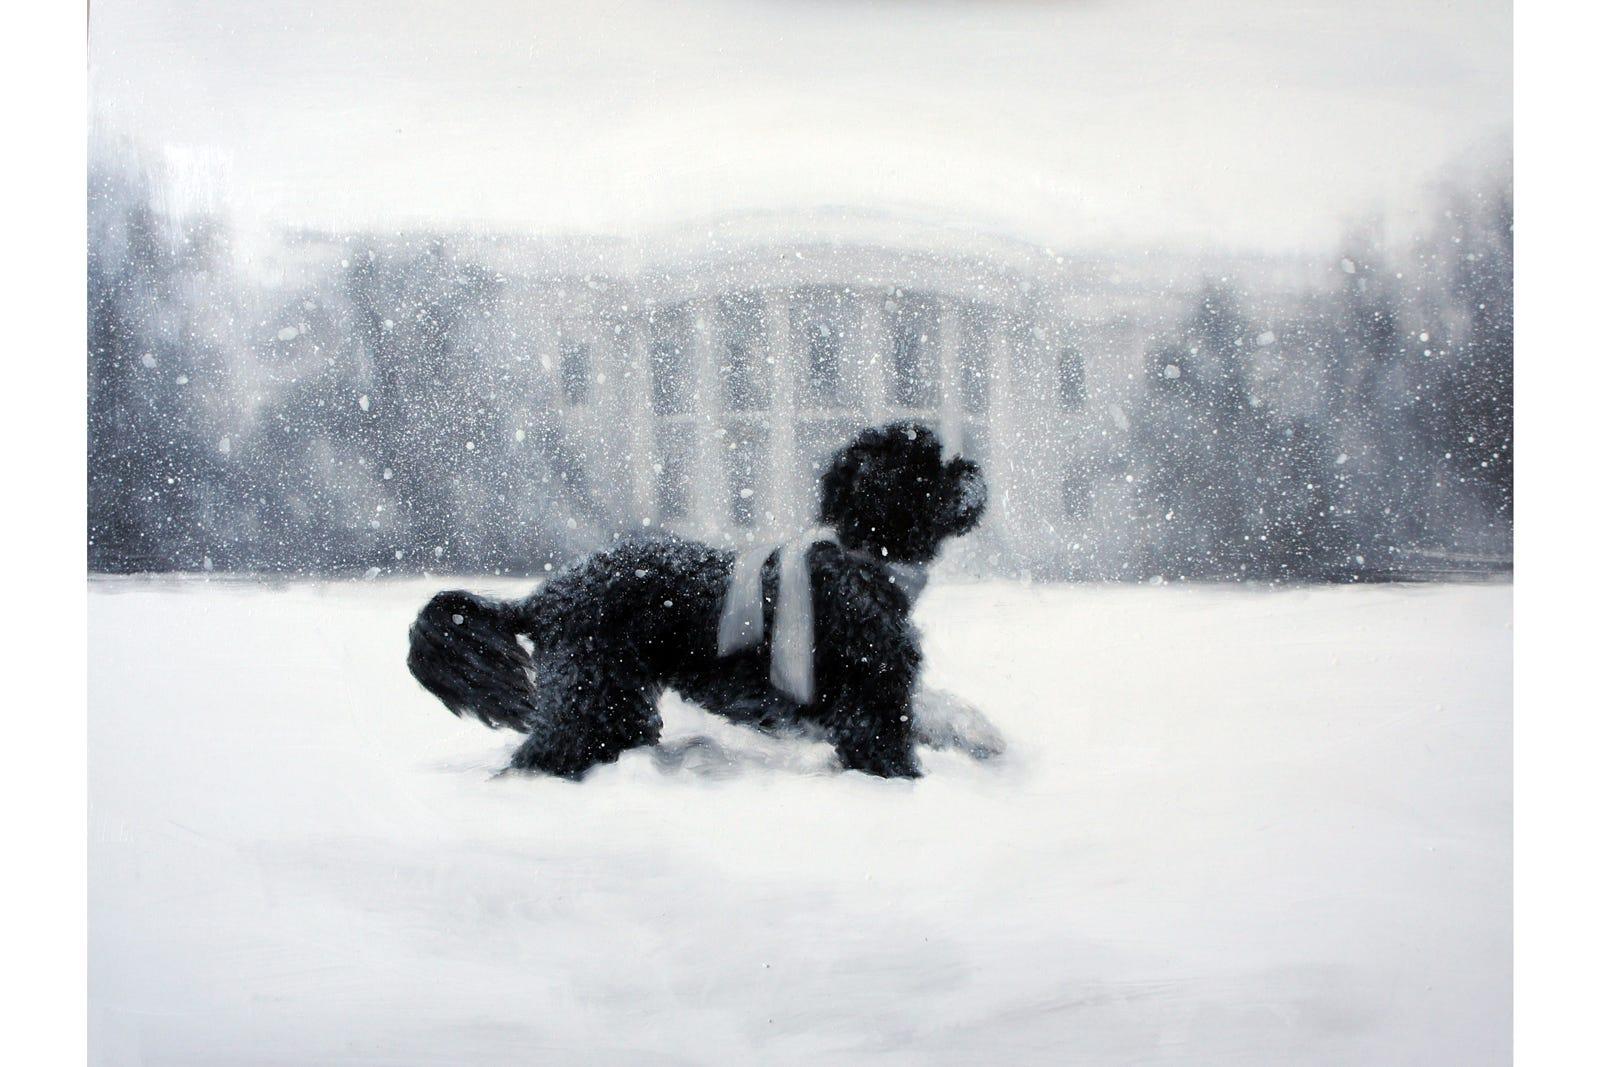 President Obamas Holiday Cards Last Christmas